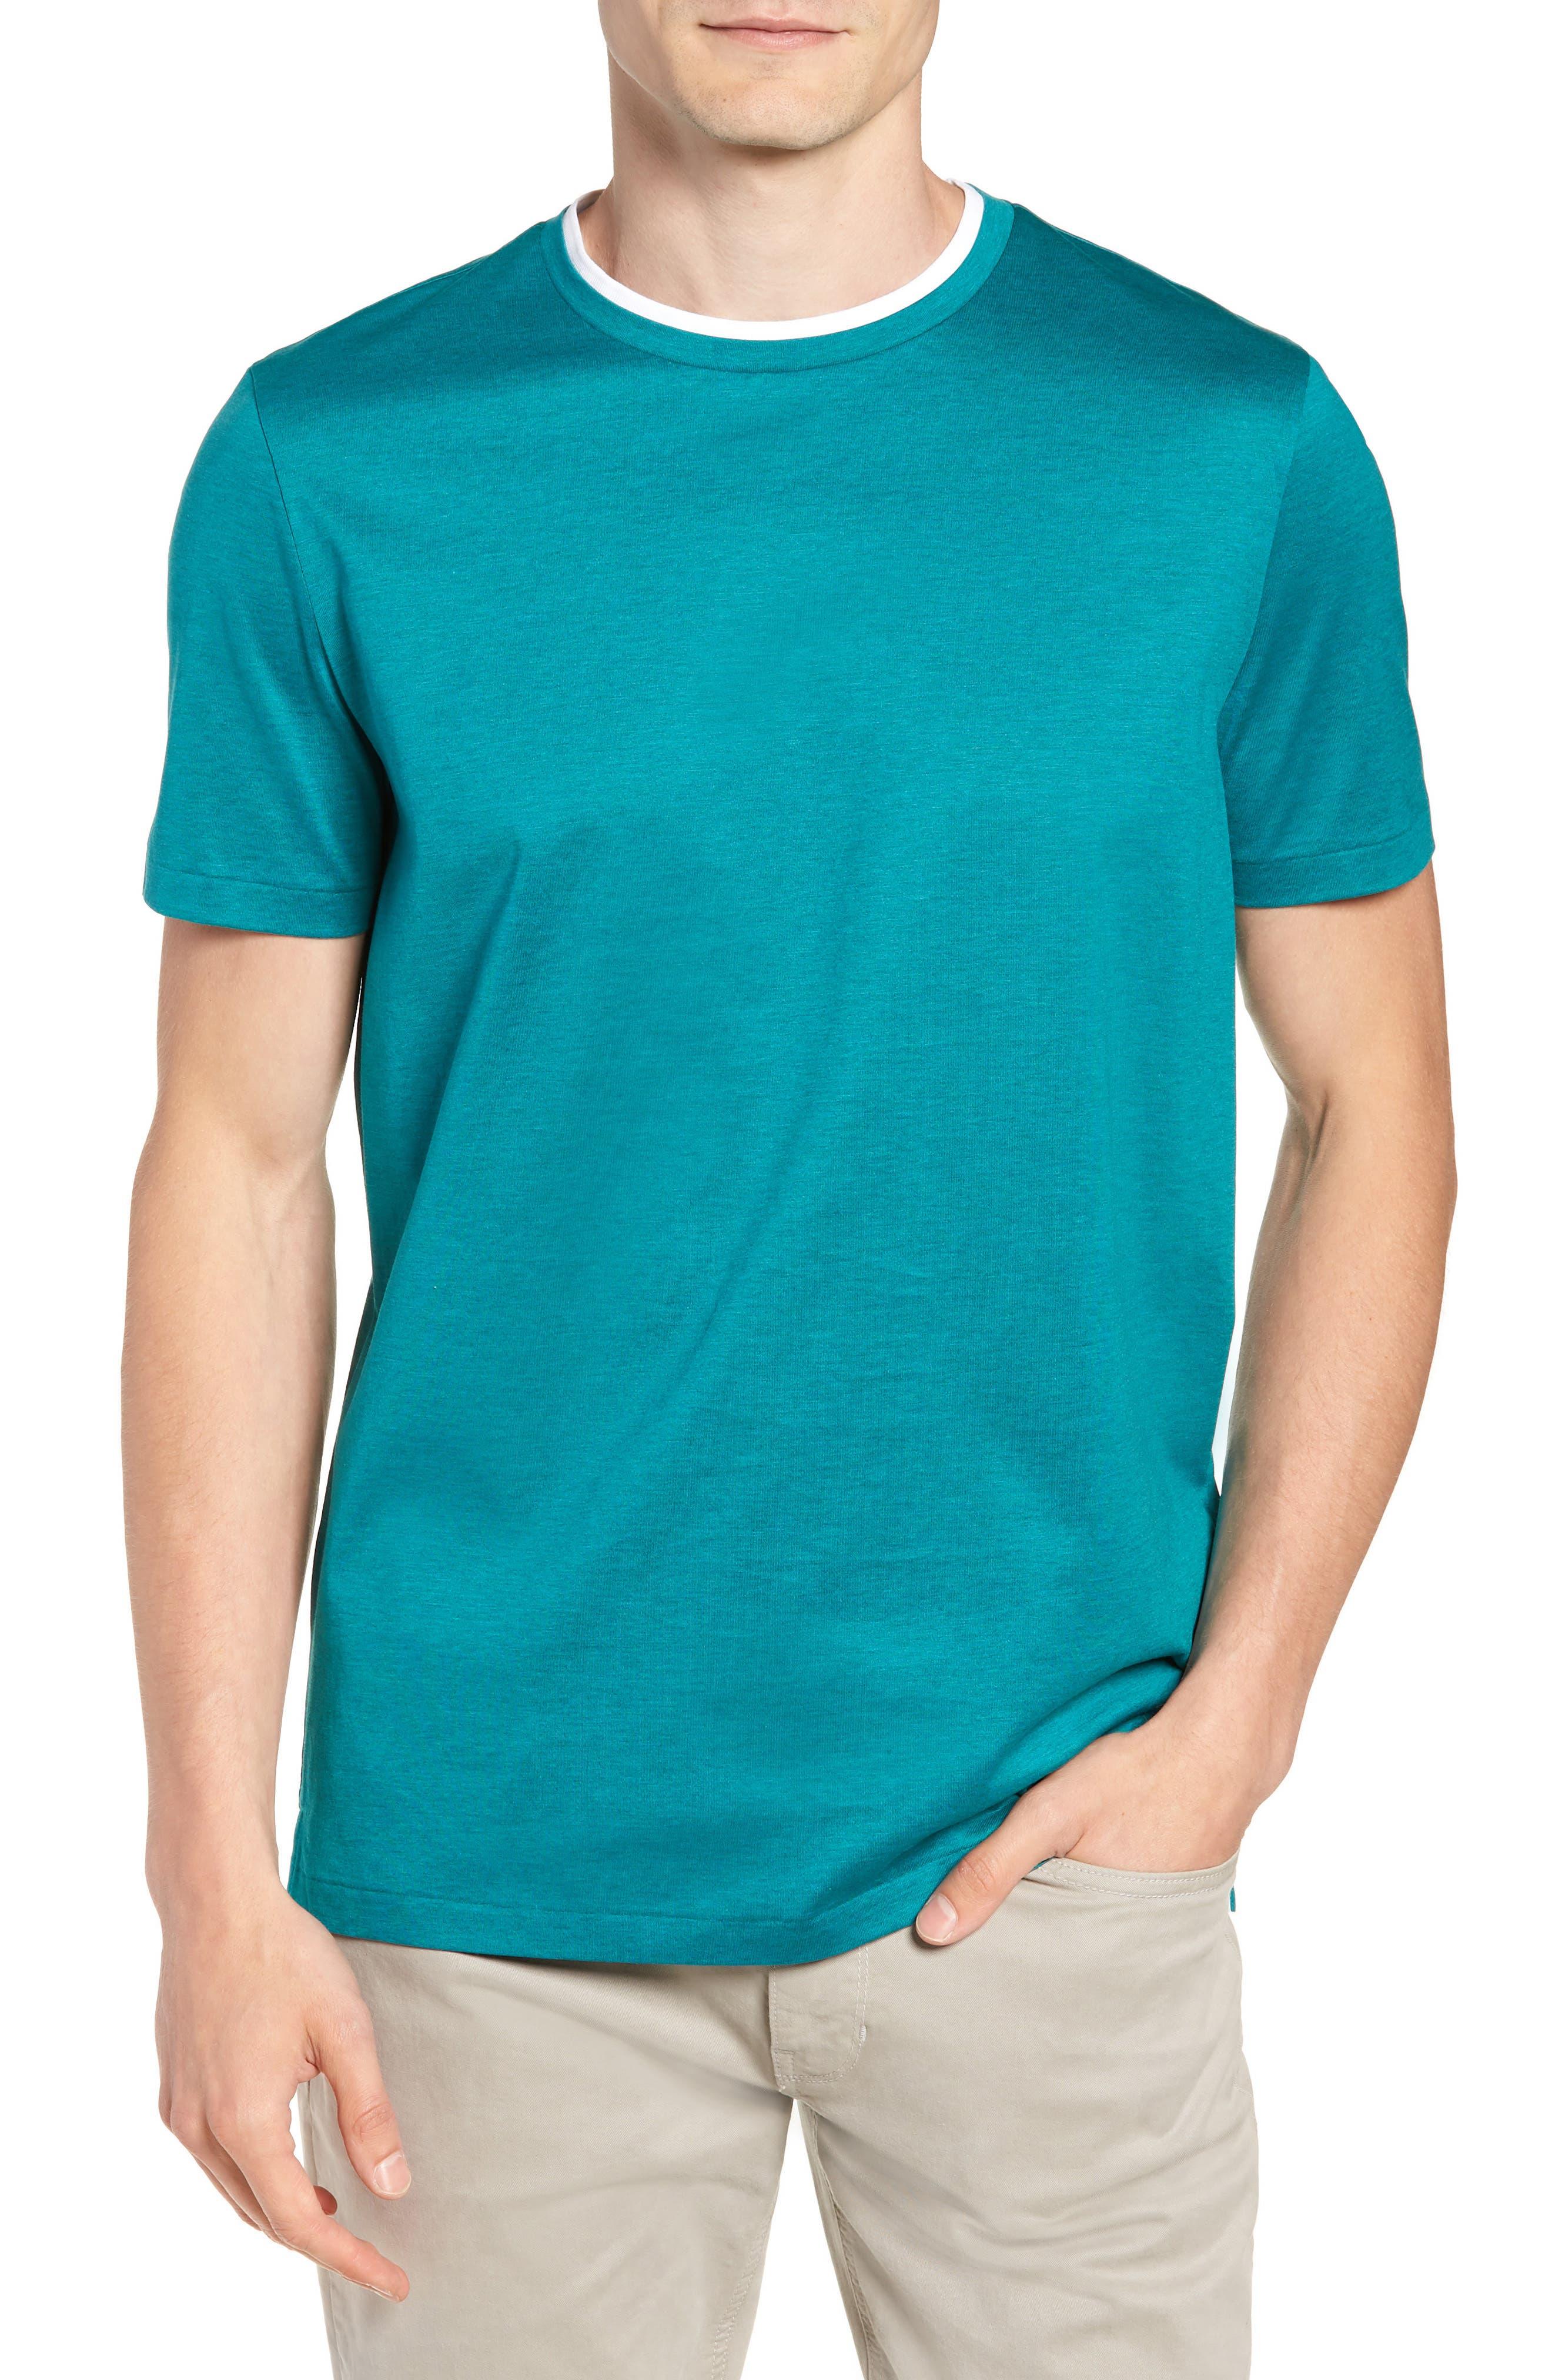 Taber Regular Fit T-Shirt,                             Main thumbnail 1, color,                             312